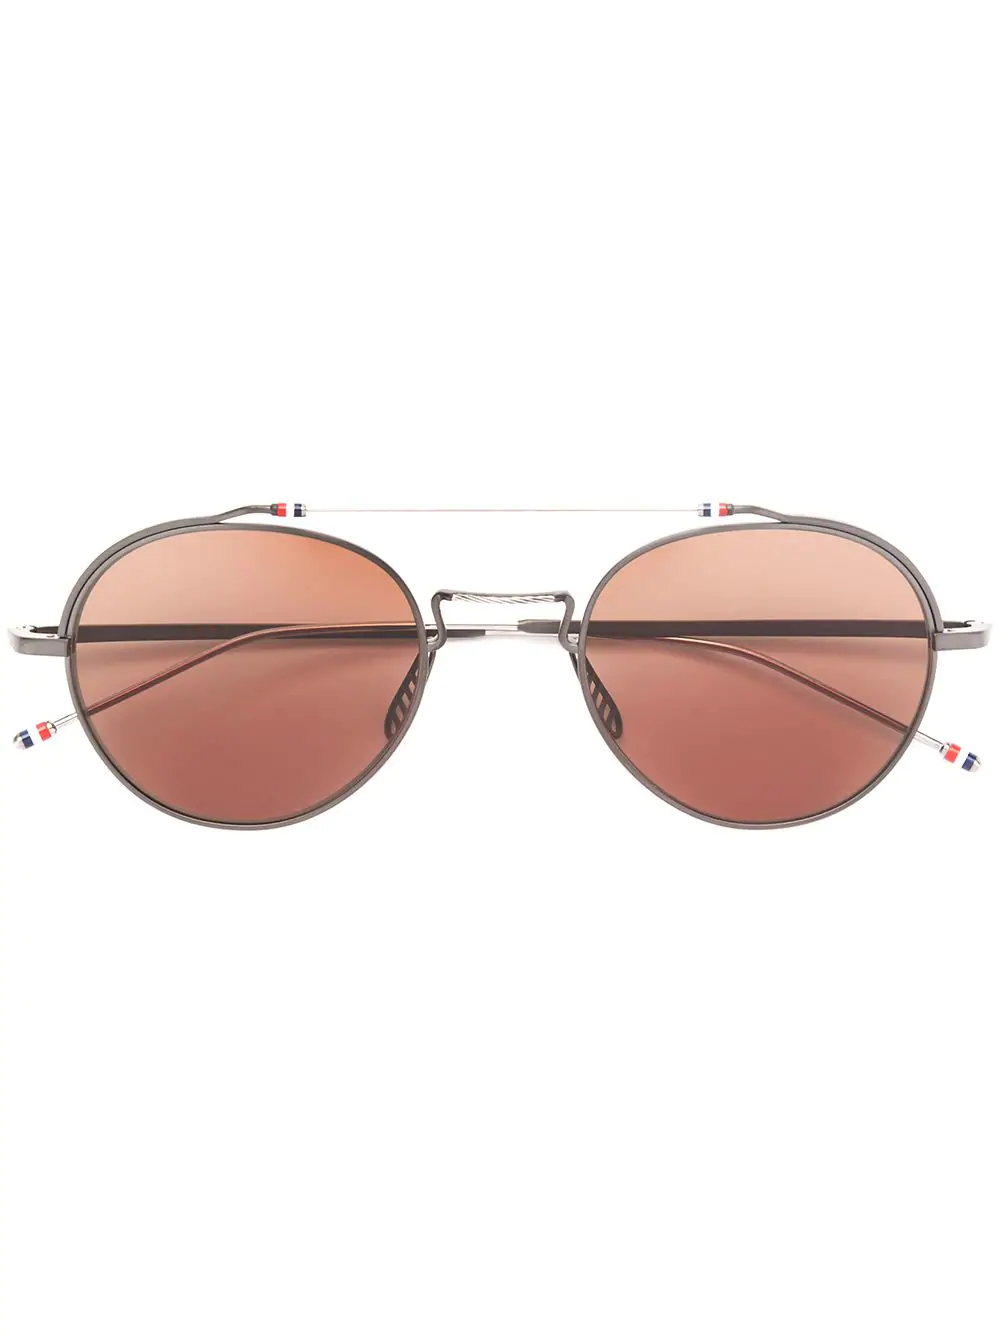 2404b97048d7 Thom Browne Eyewear Black Iron   Silver Sunglasses